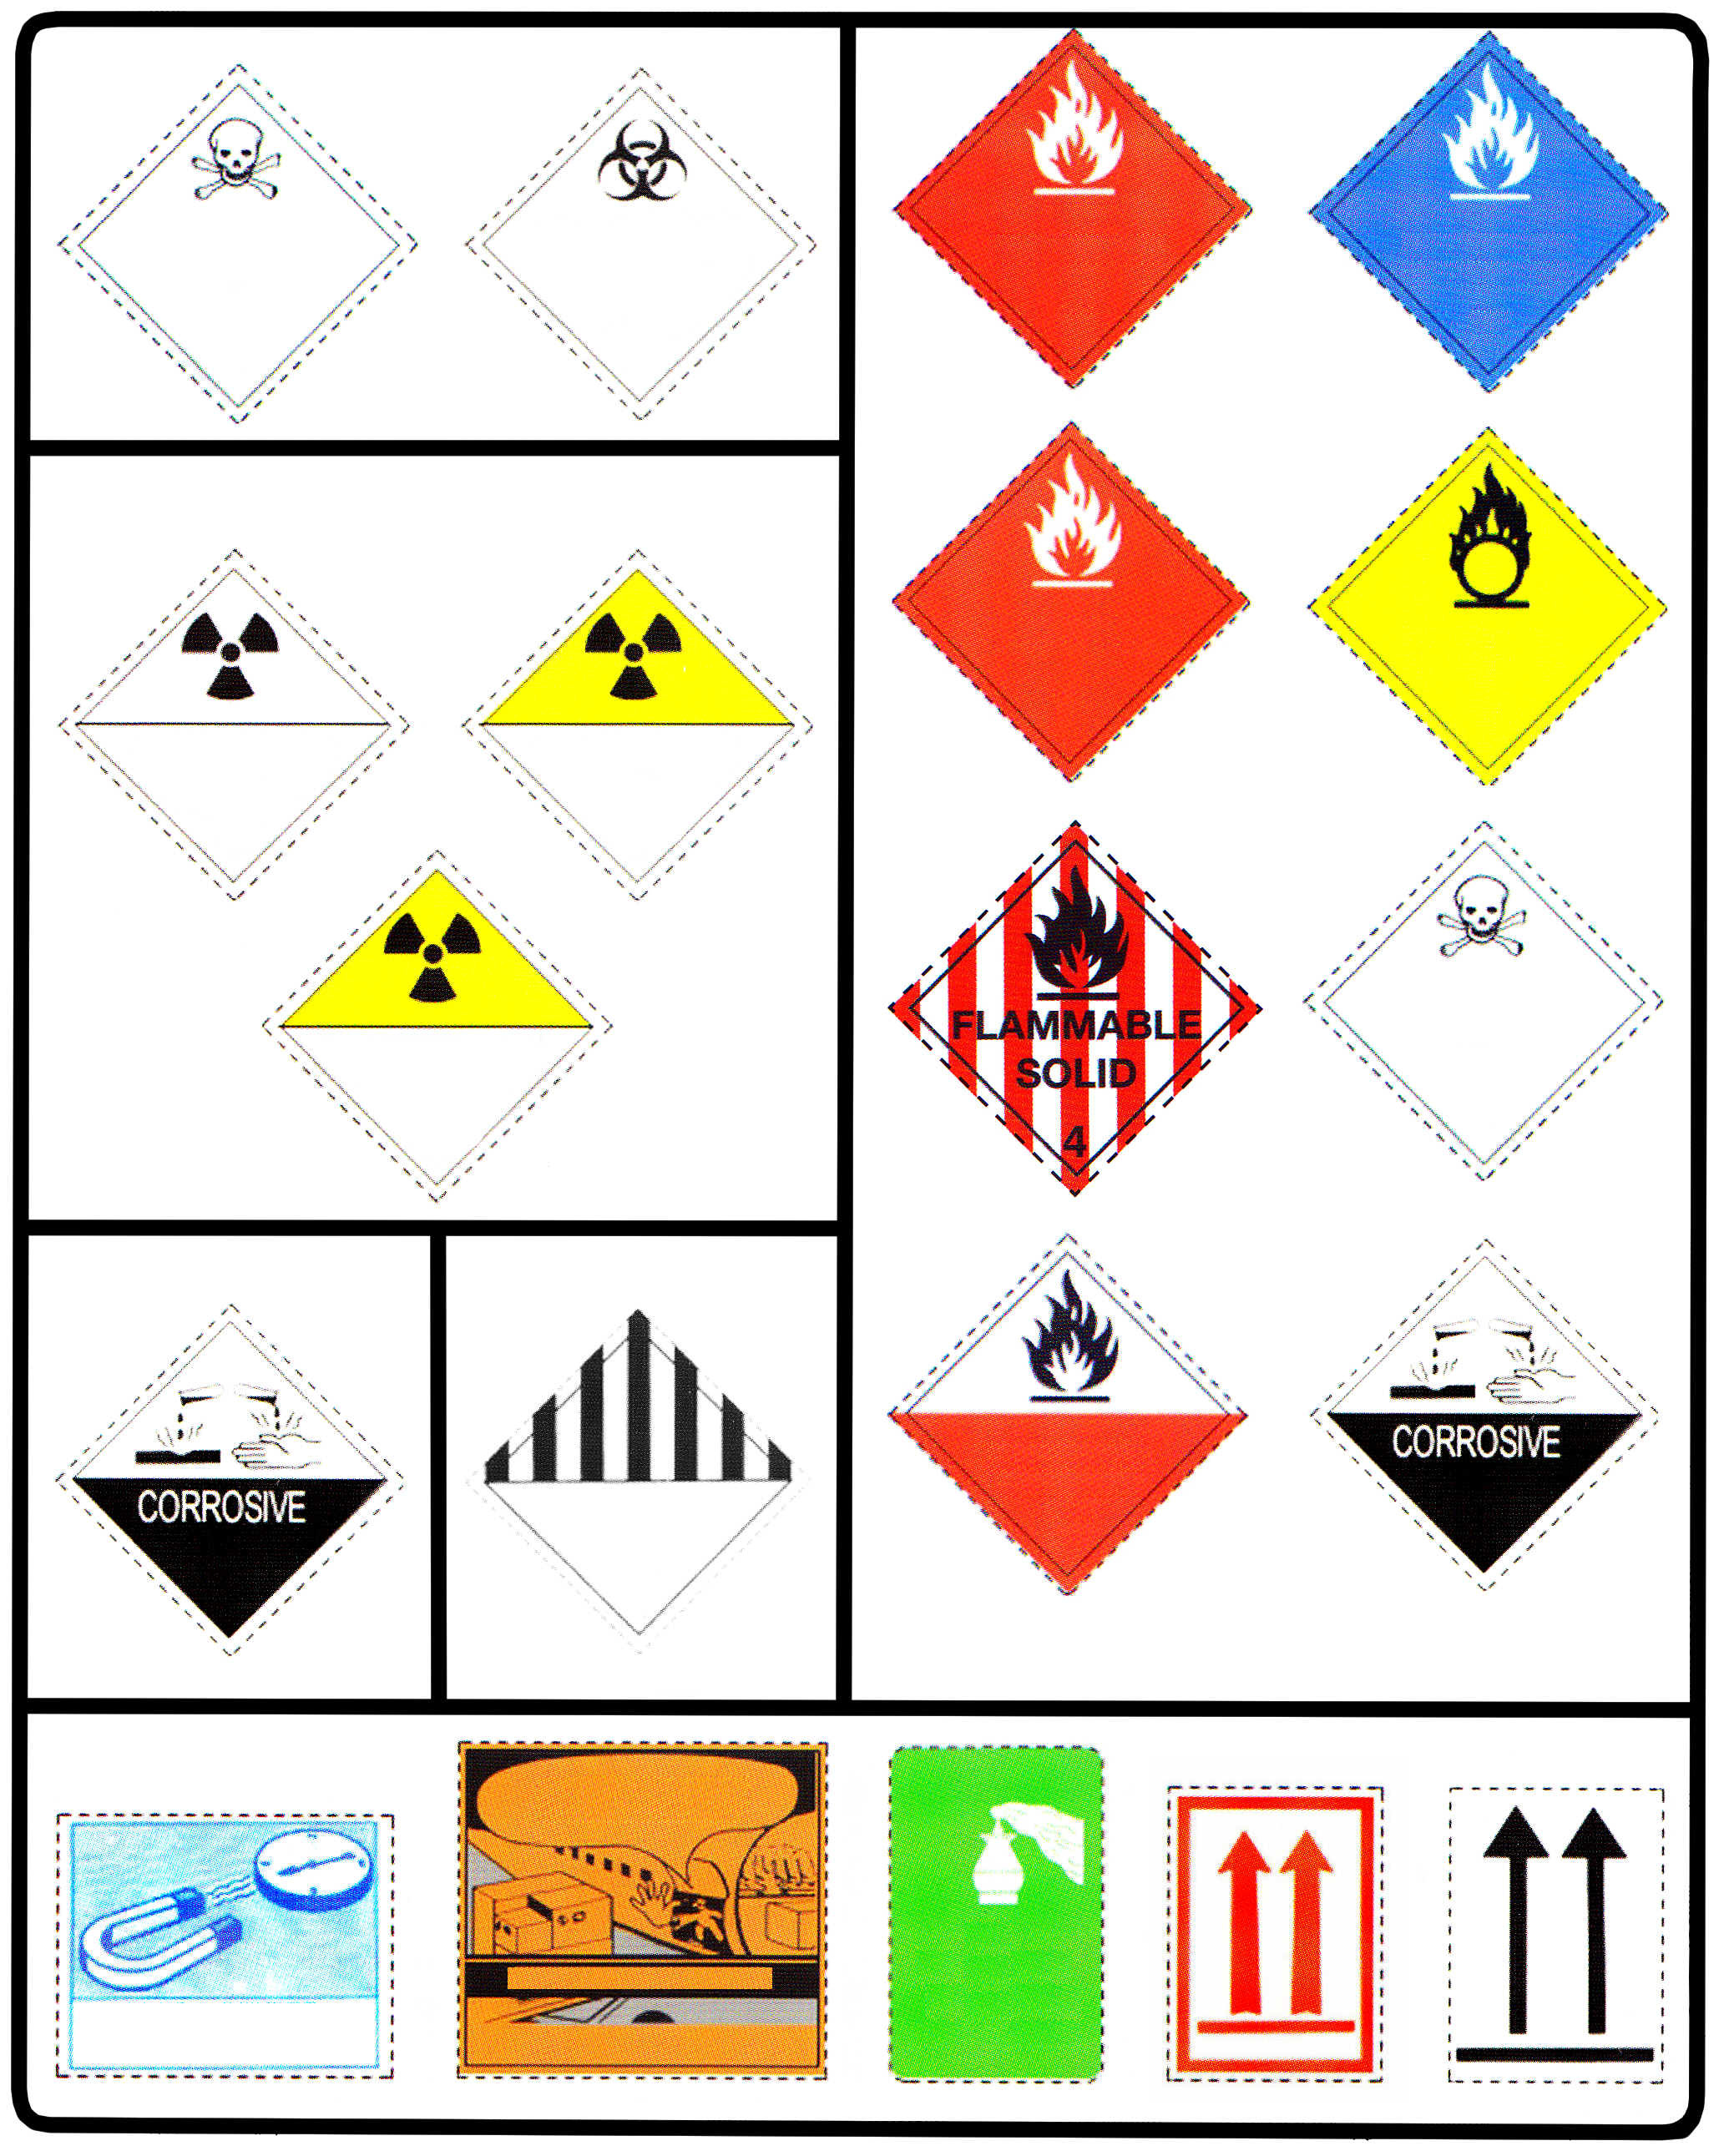 Dangerous Goods Awareness Training